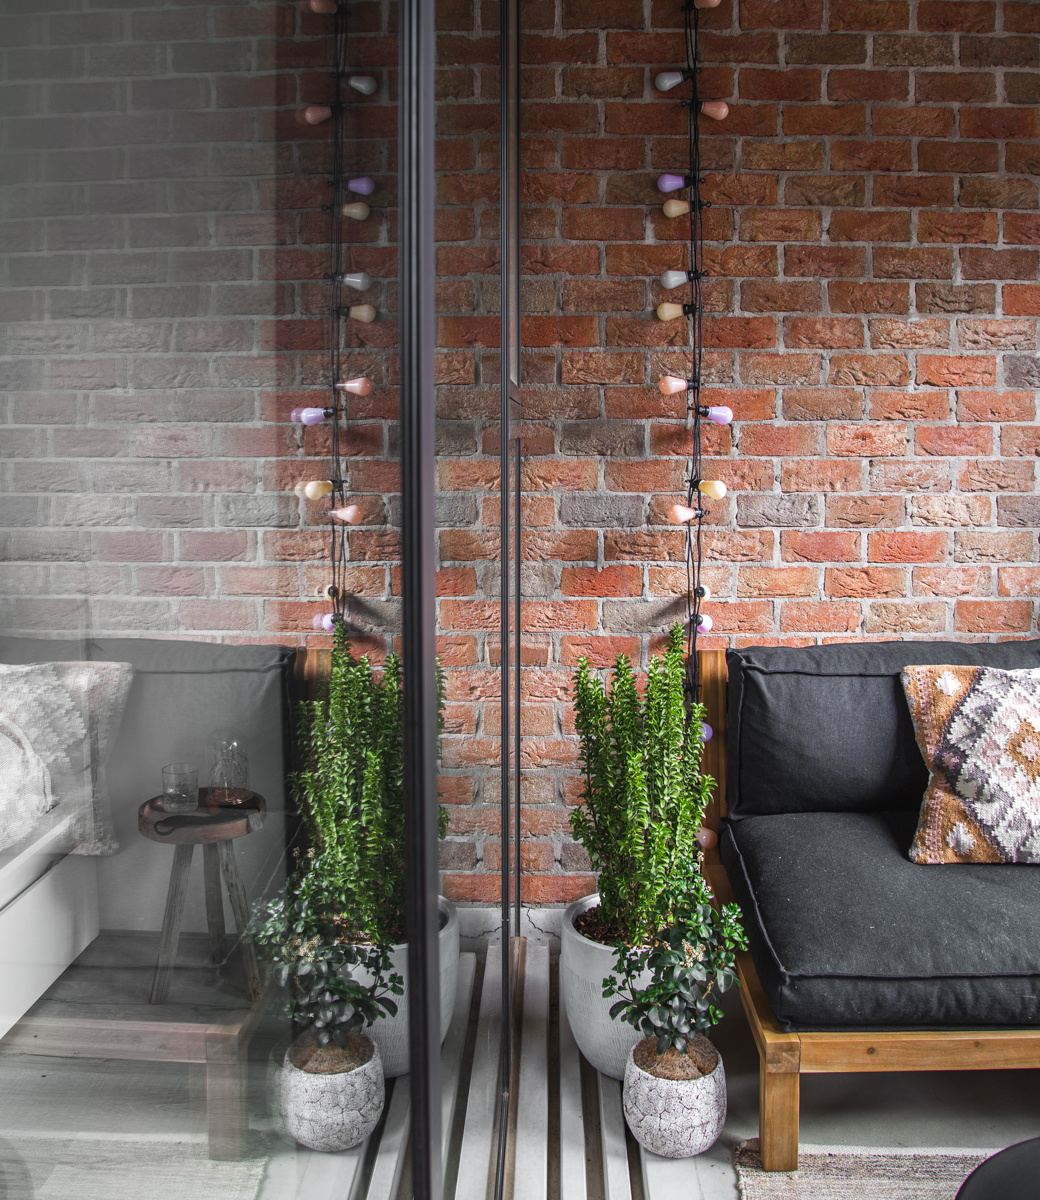 LEDR buiten feestverlichting roze en paars - Outdoor Patio Lichtslinger Lavender - 10 LED lampen - E